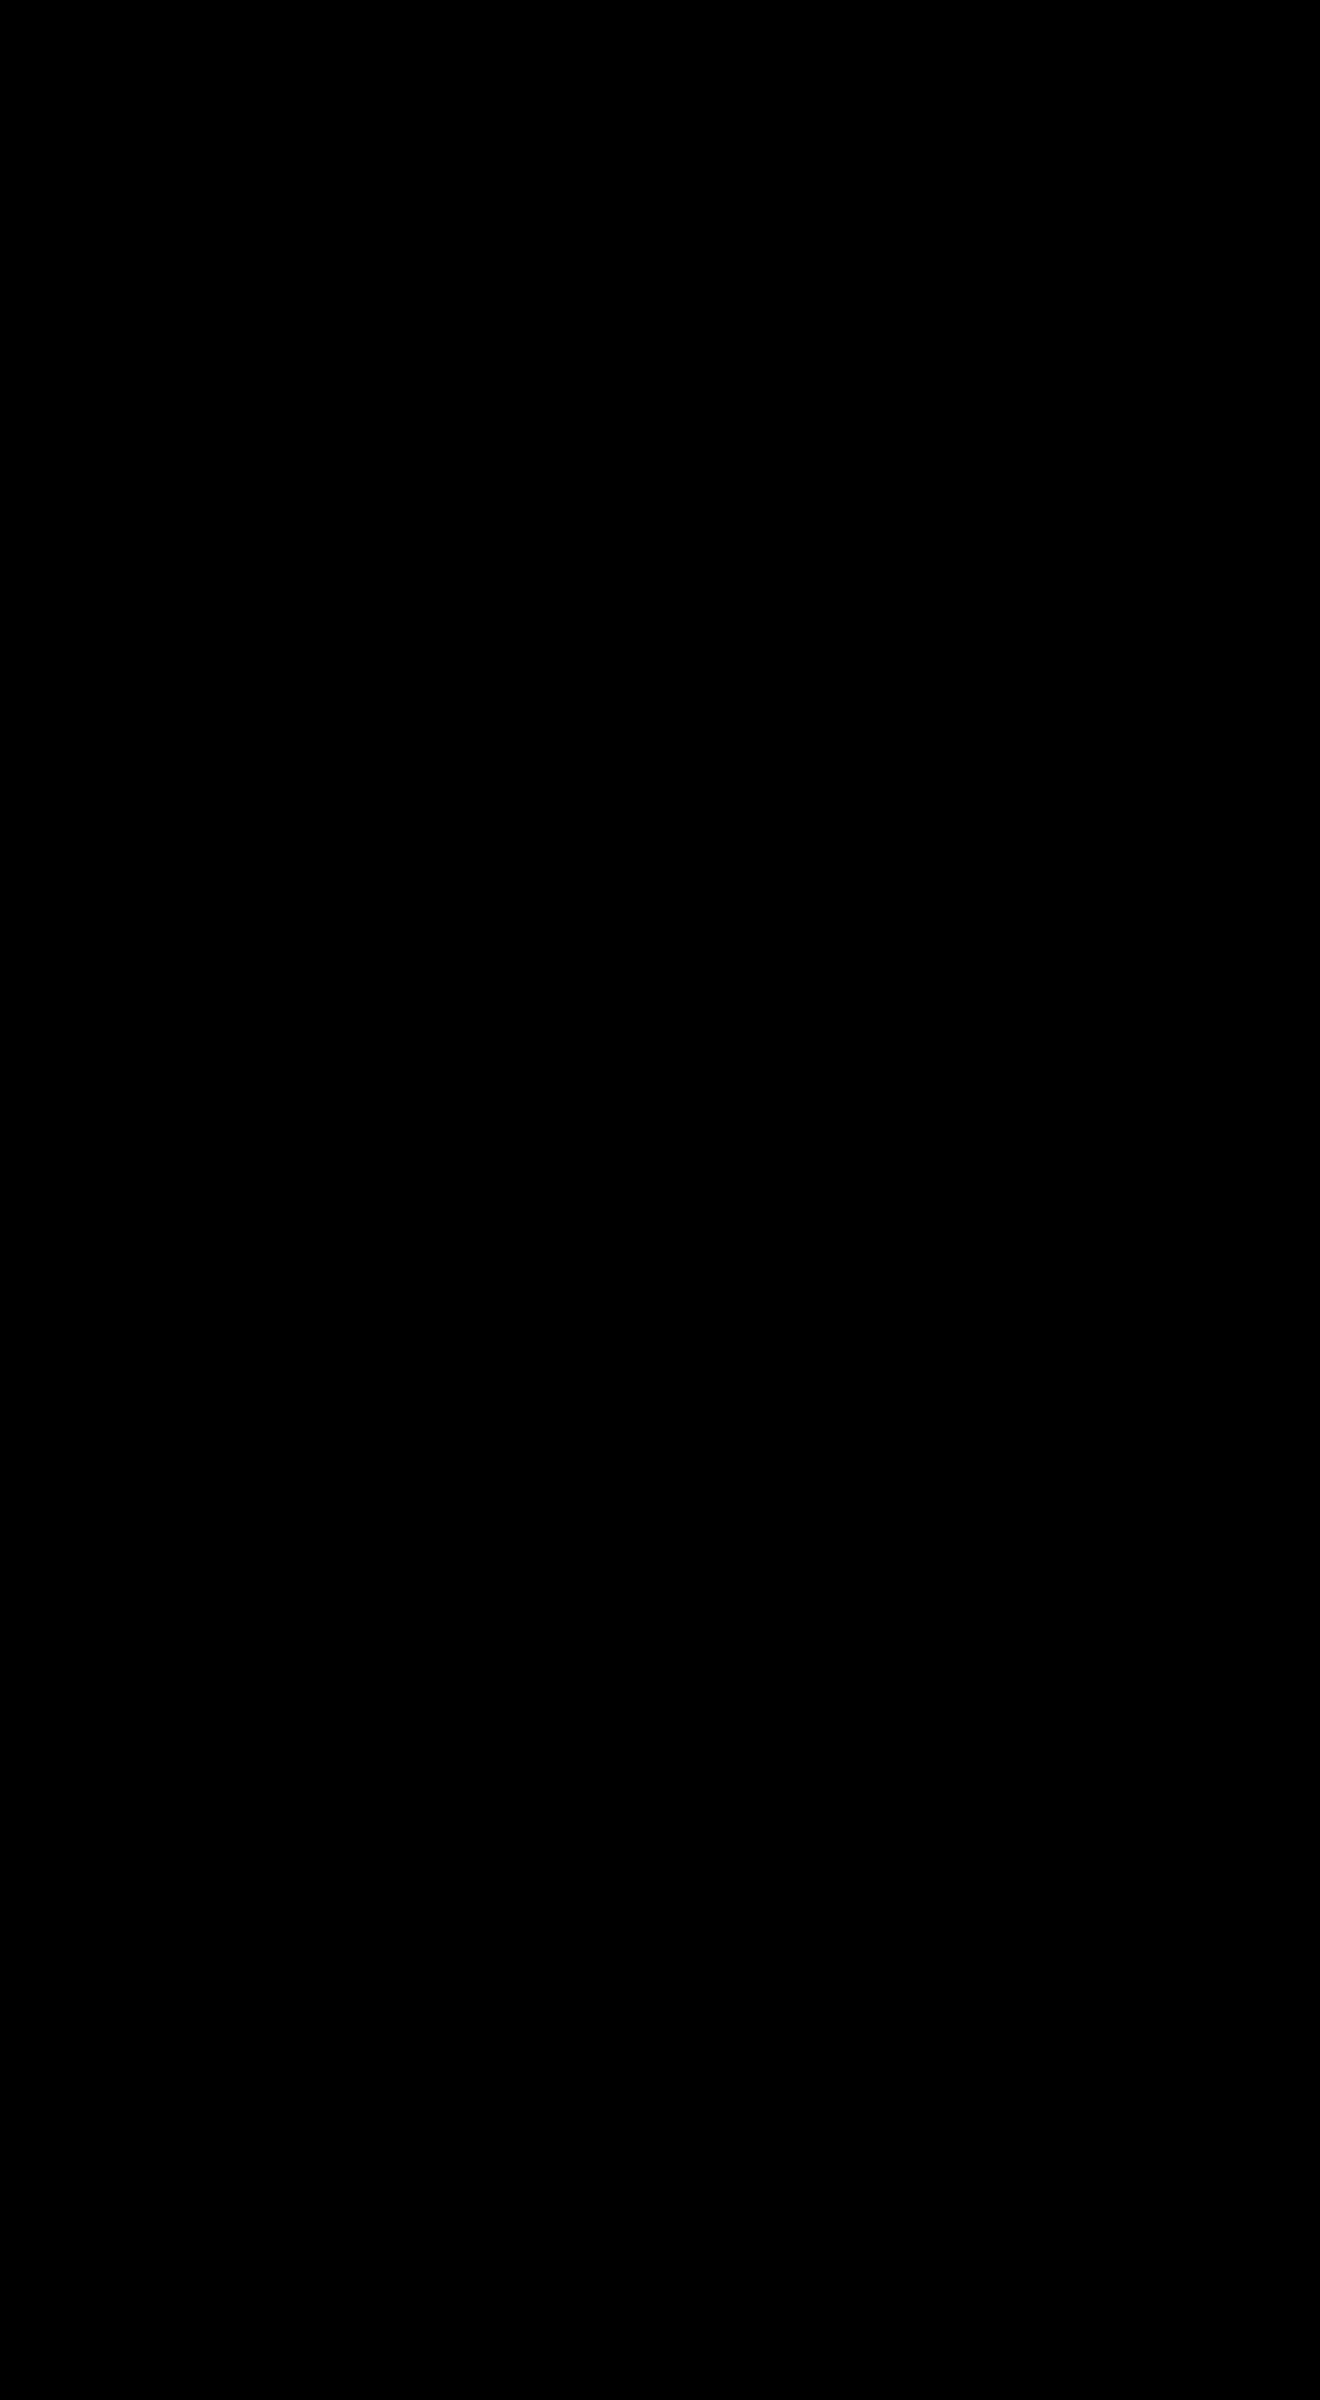 People Running Silhouette at GetDrawings.com | Free for personal use ... for people running silhouette png  lp4eri